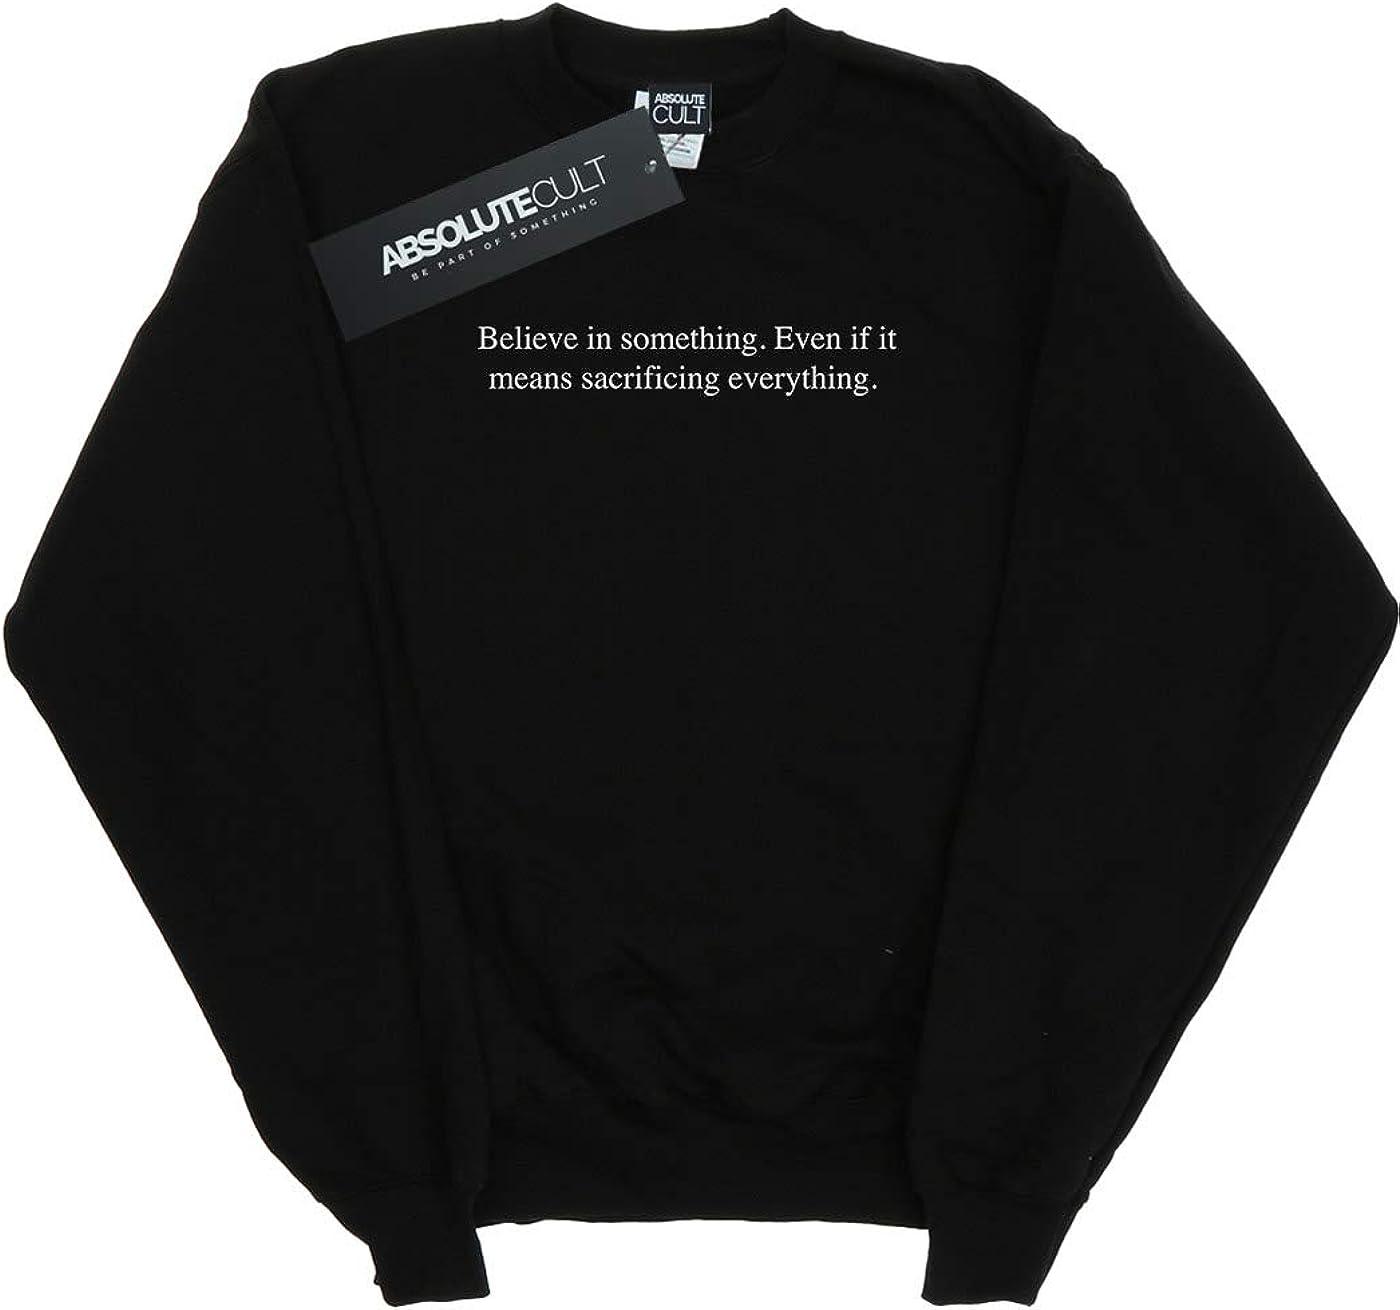 ABSOLUTECULT Drewbacca Girls Sacrifice Everything Sweatshirt